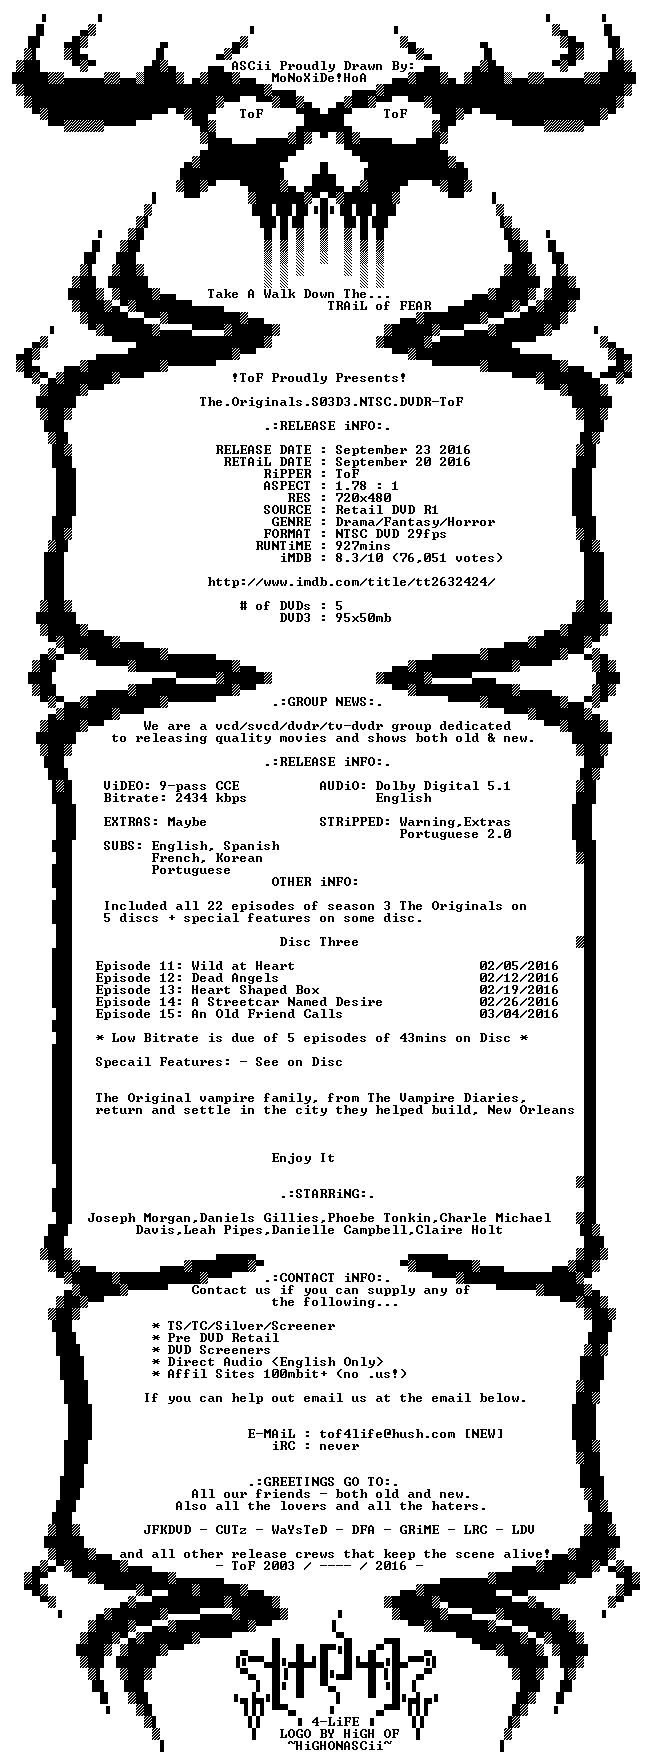 The Originals S03 NTSC DVDR-ToF